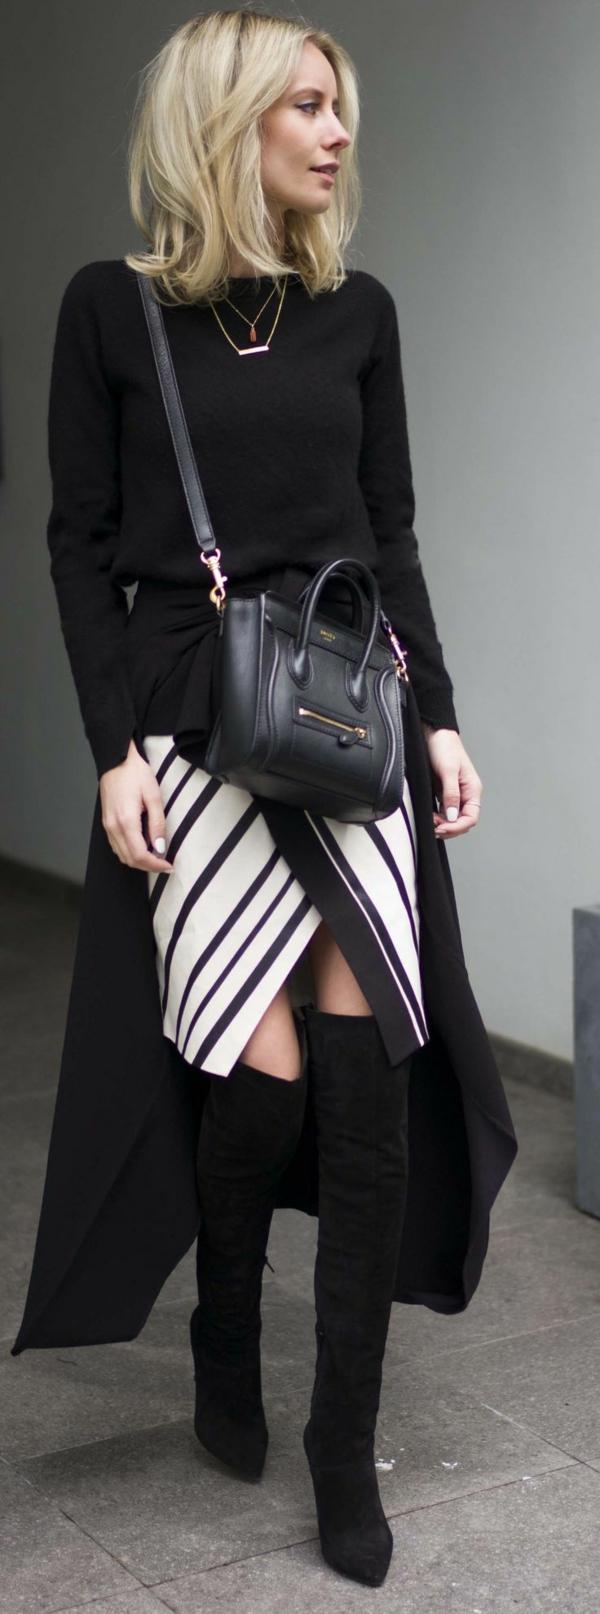 jupe-portefeuille-rayures-diagonales